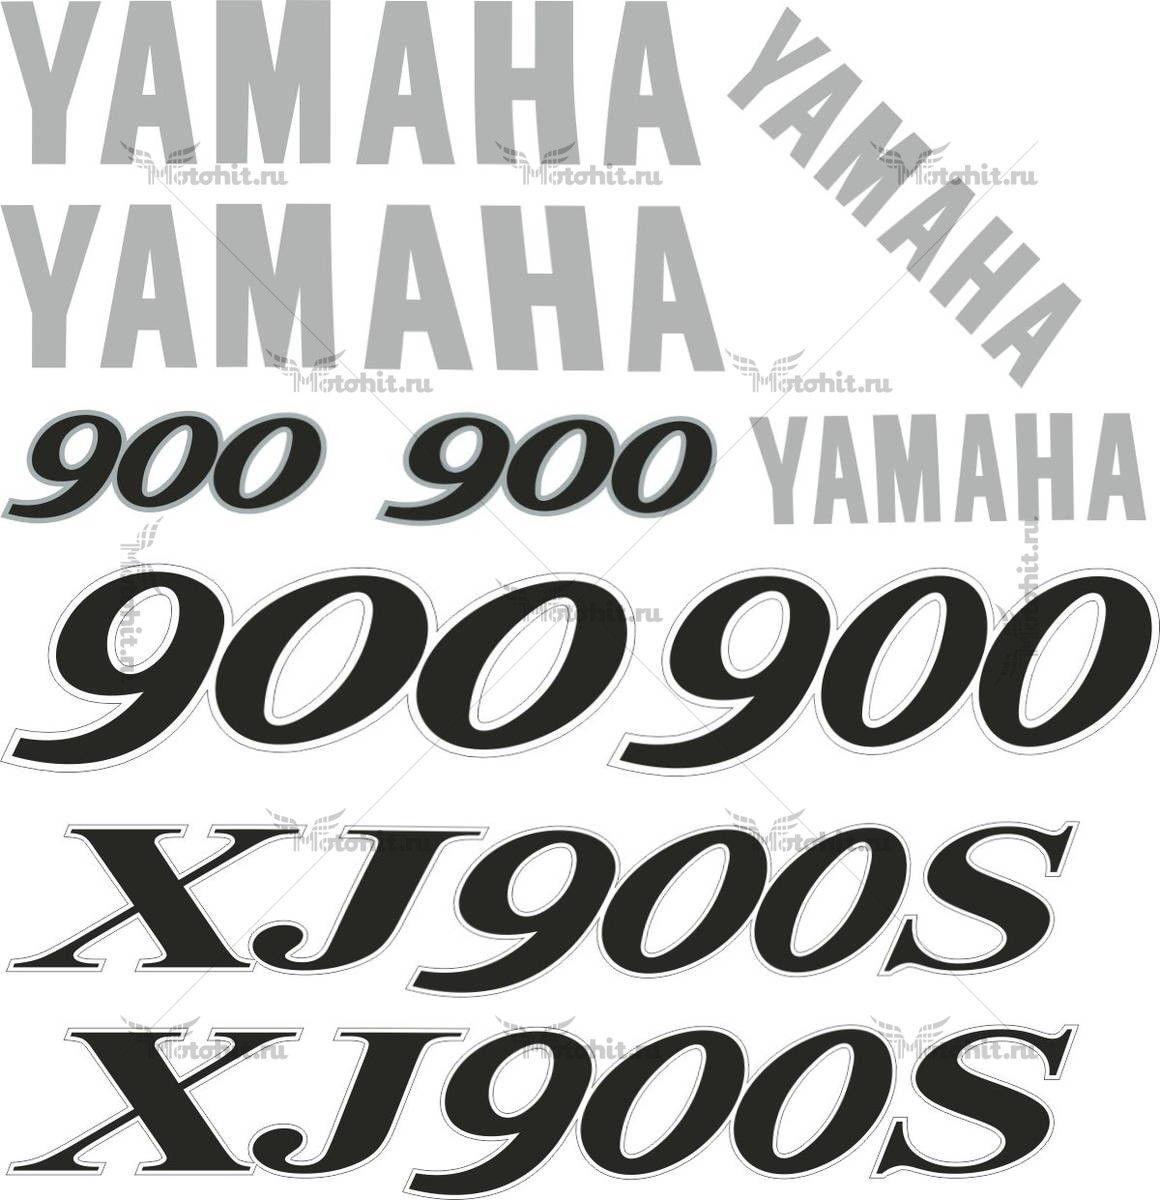 Комплект наклеек Yamaha XJ-900